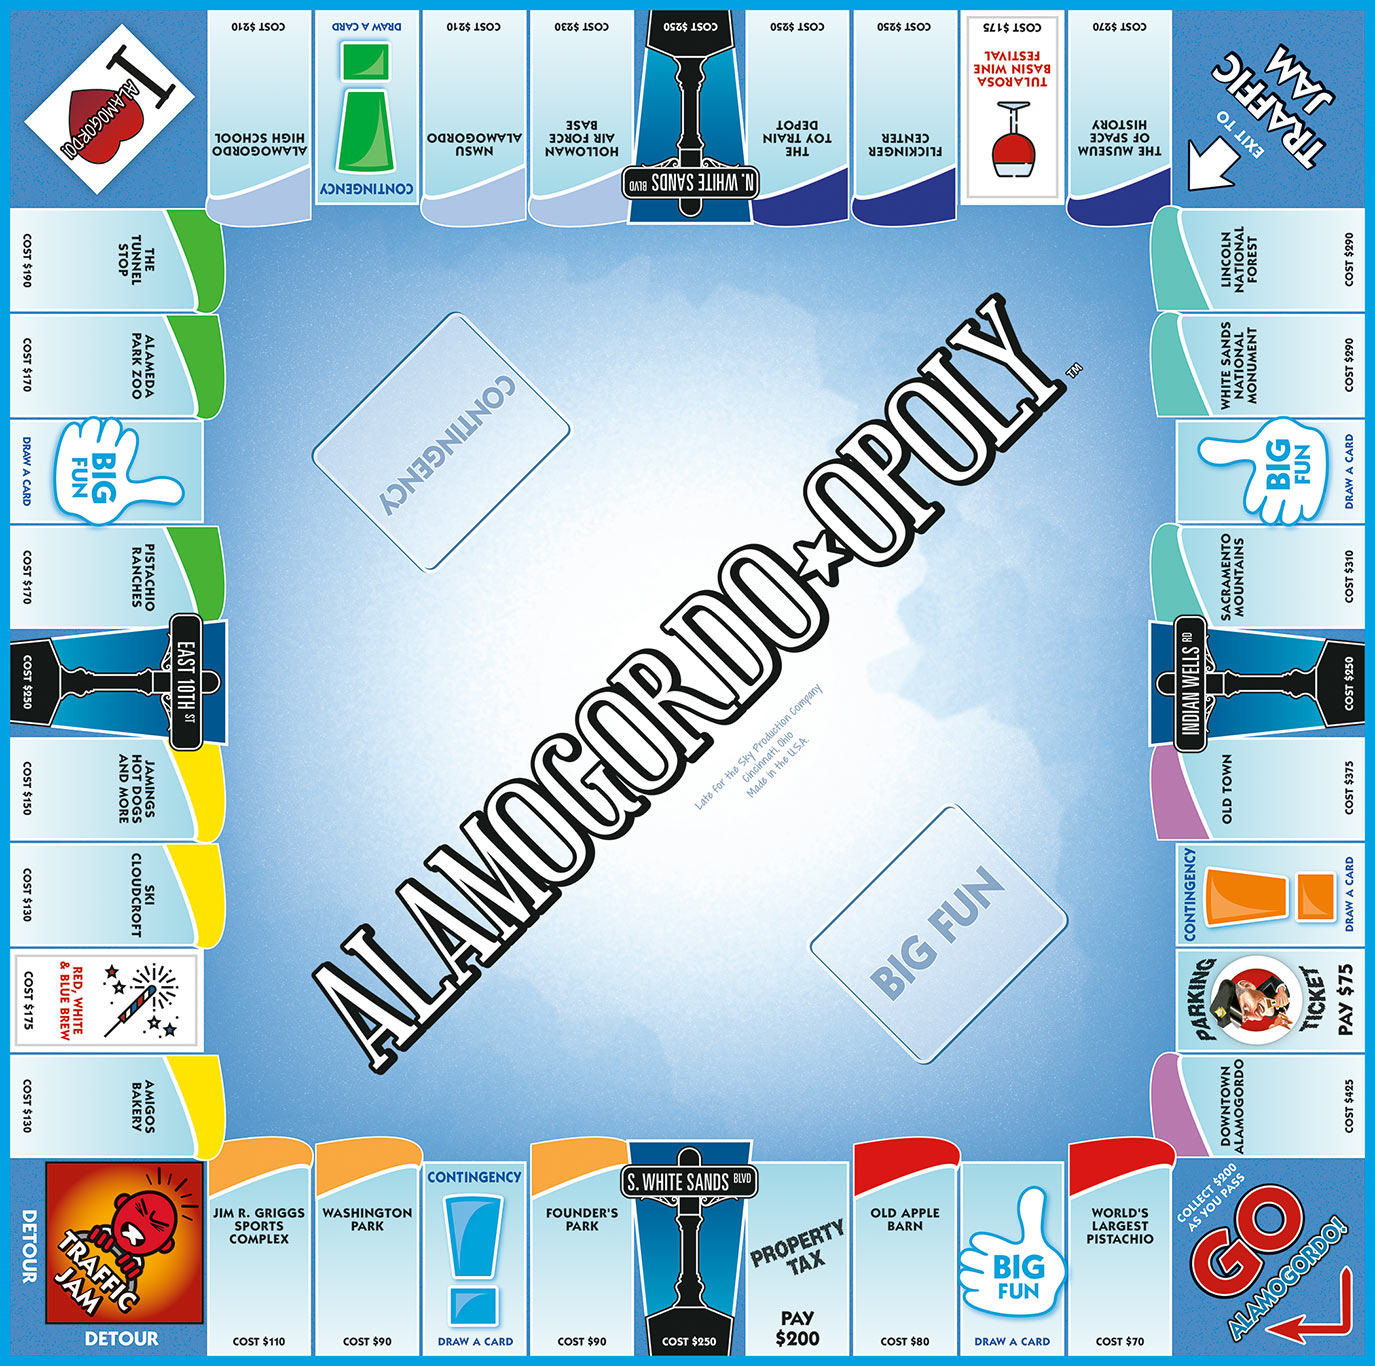 ALAMOGORDO-OPOLY Board Game